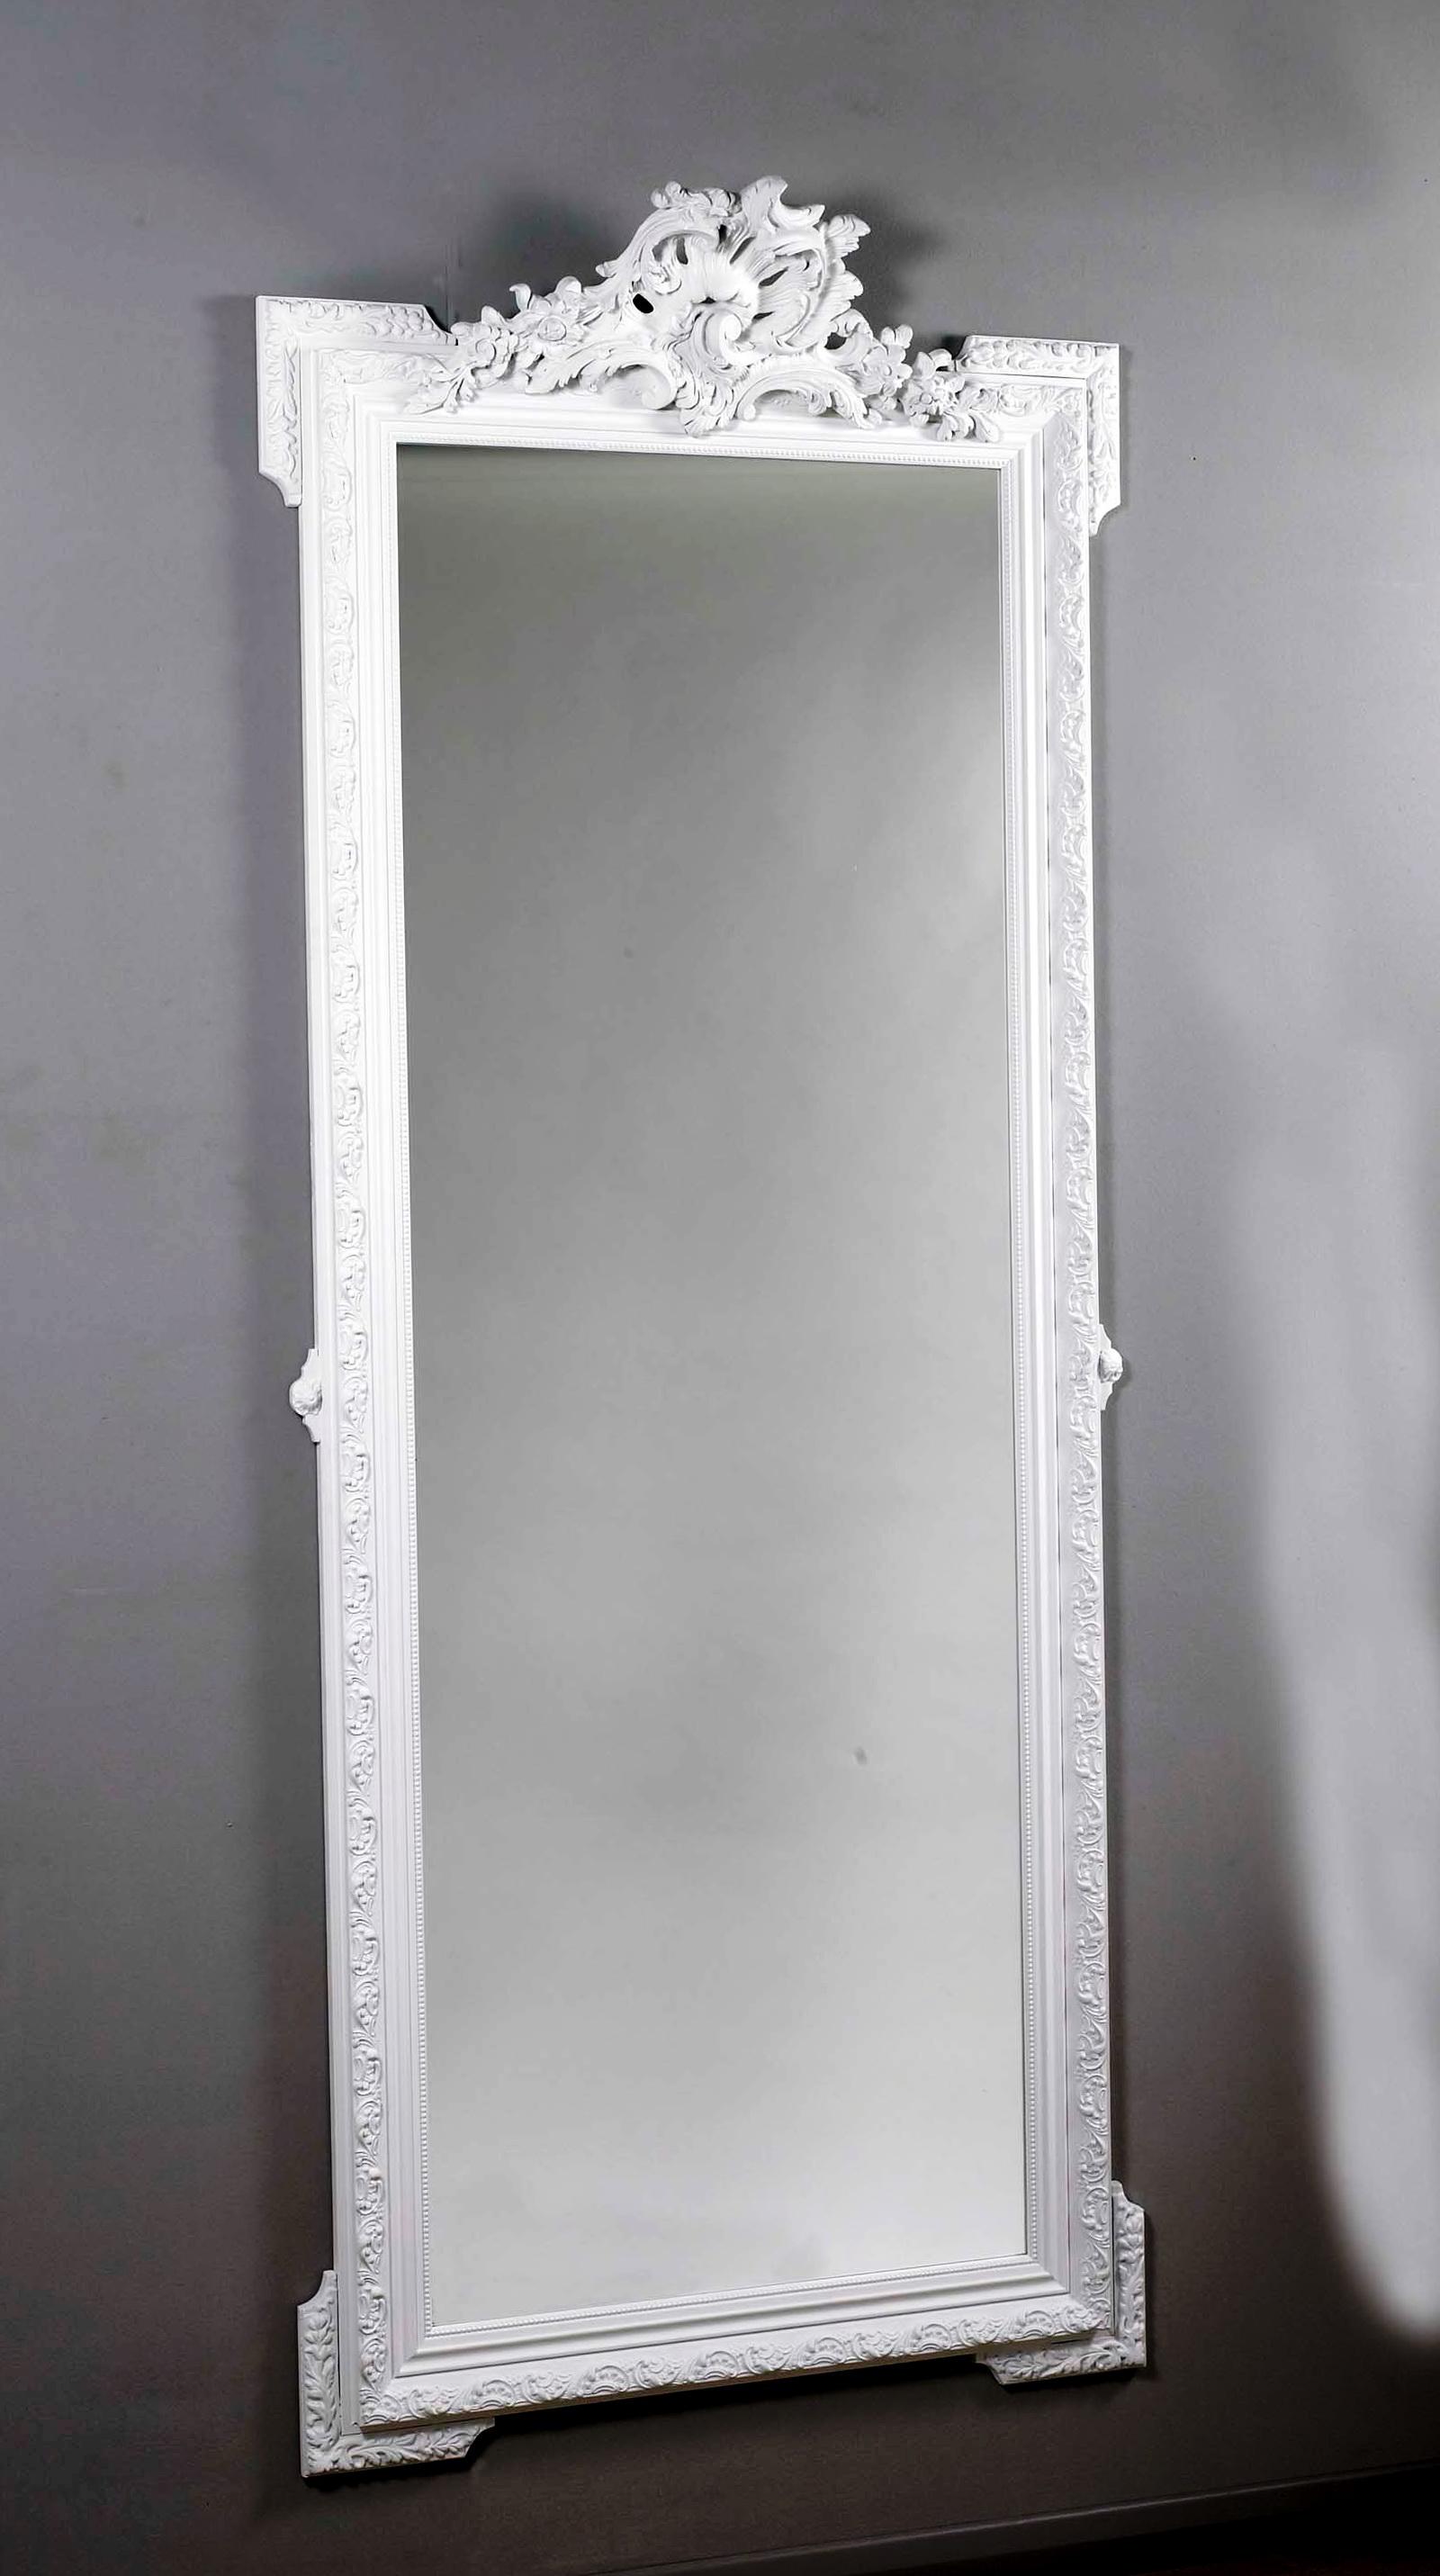 Large Framed Mirrors Uk